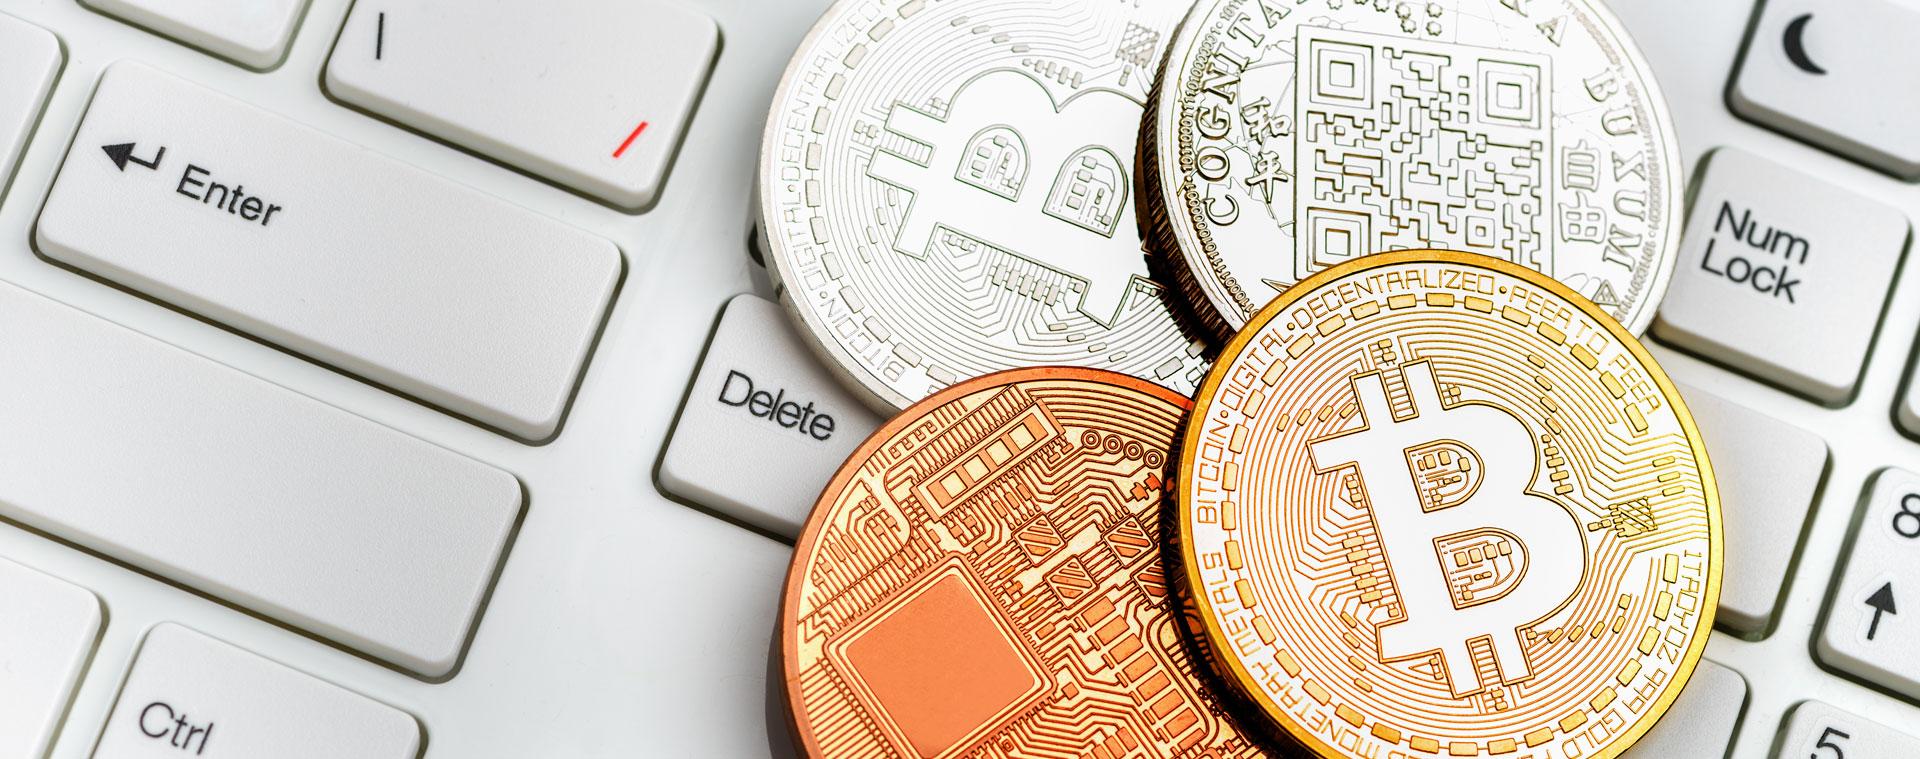 BitCoin To Billions